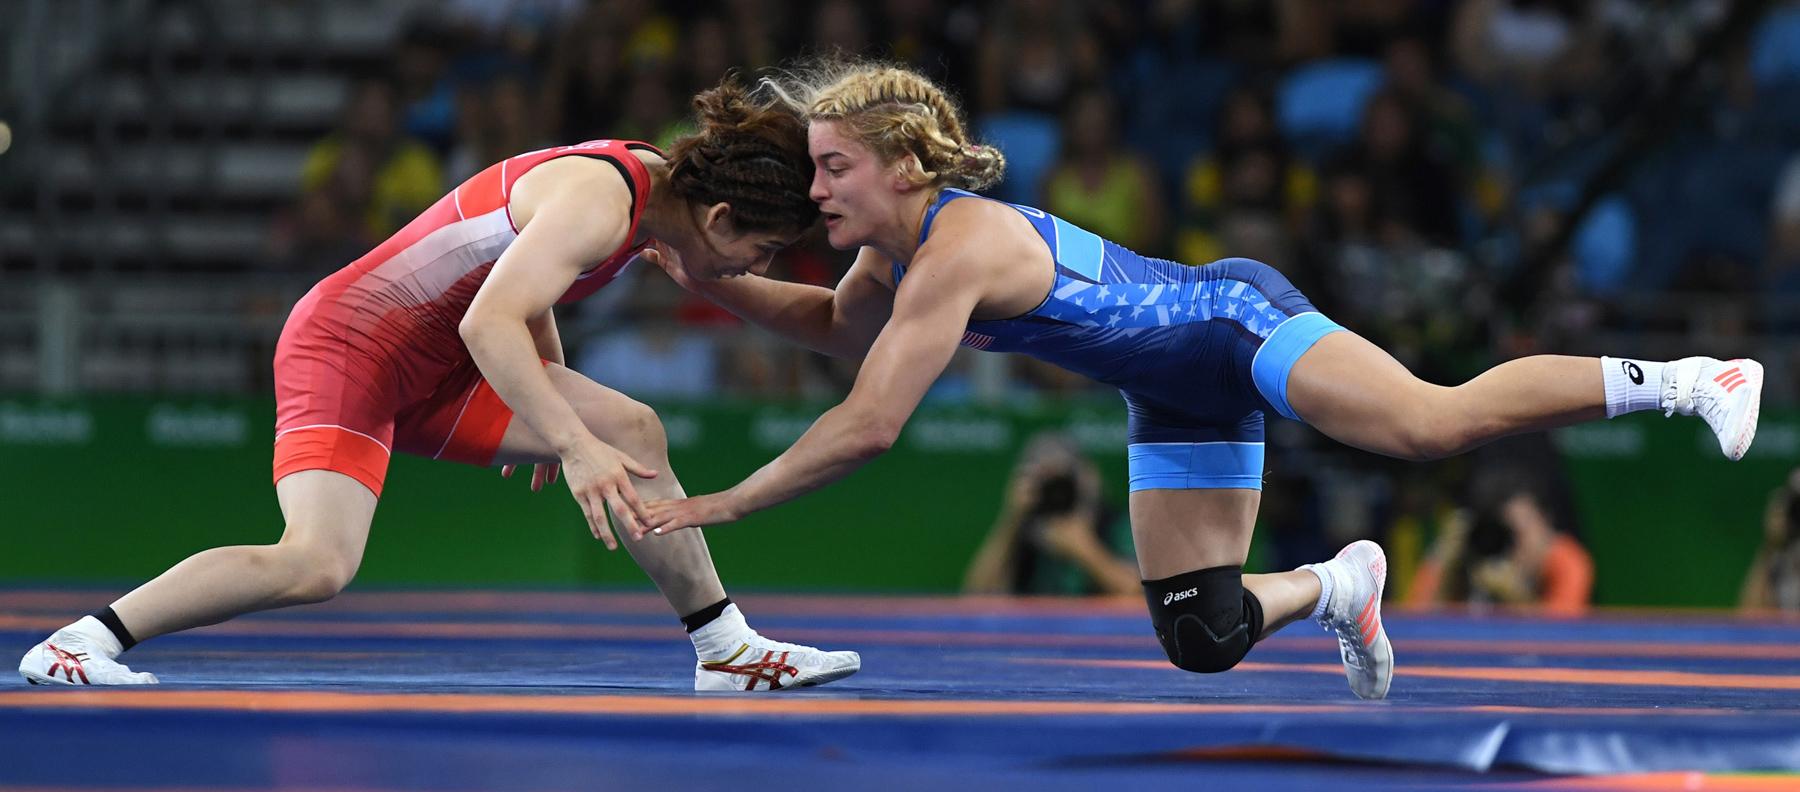 Two women wrestling on mat (© Mark Reis/Colorado Springs Gazette/TNS/Getty Images)